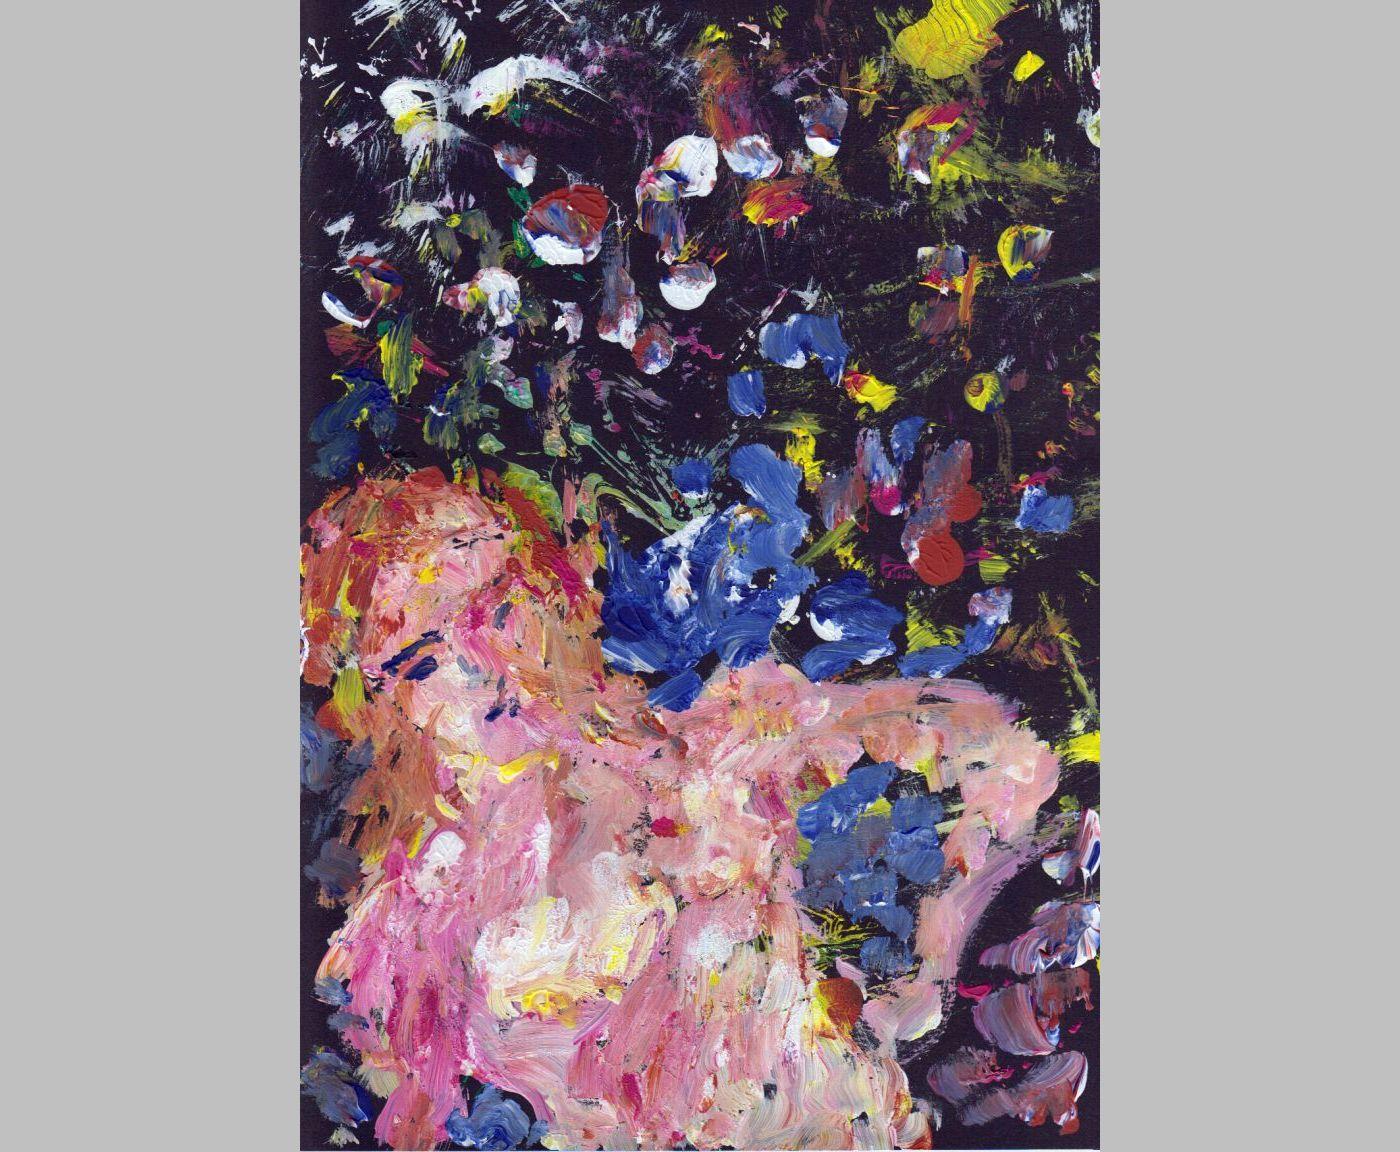 Abstrakter Akt in Acryl (1, 2013, 21 x 29,7 cm, A4)